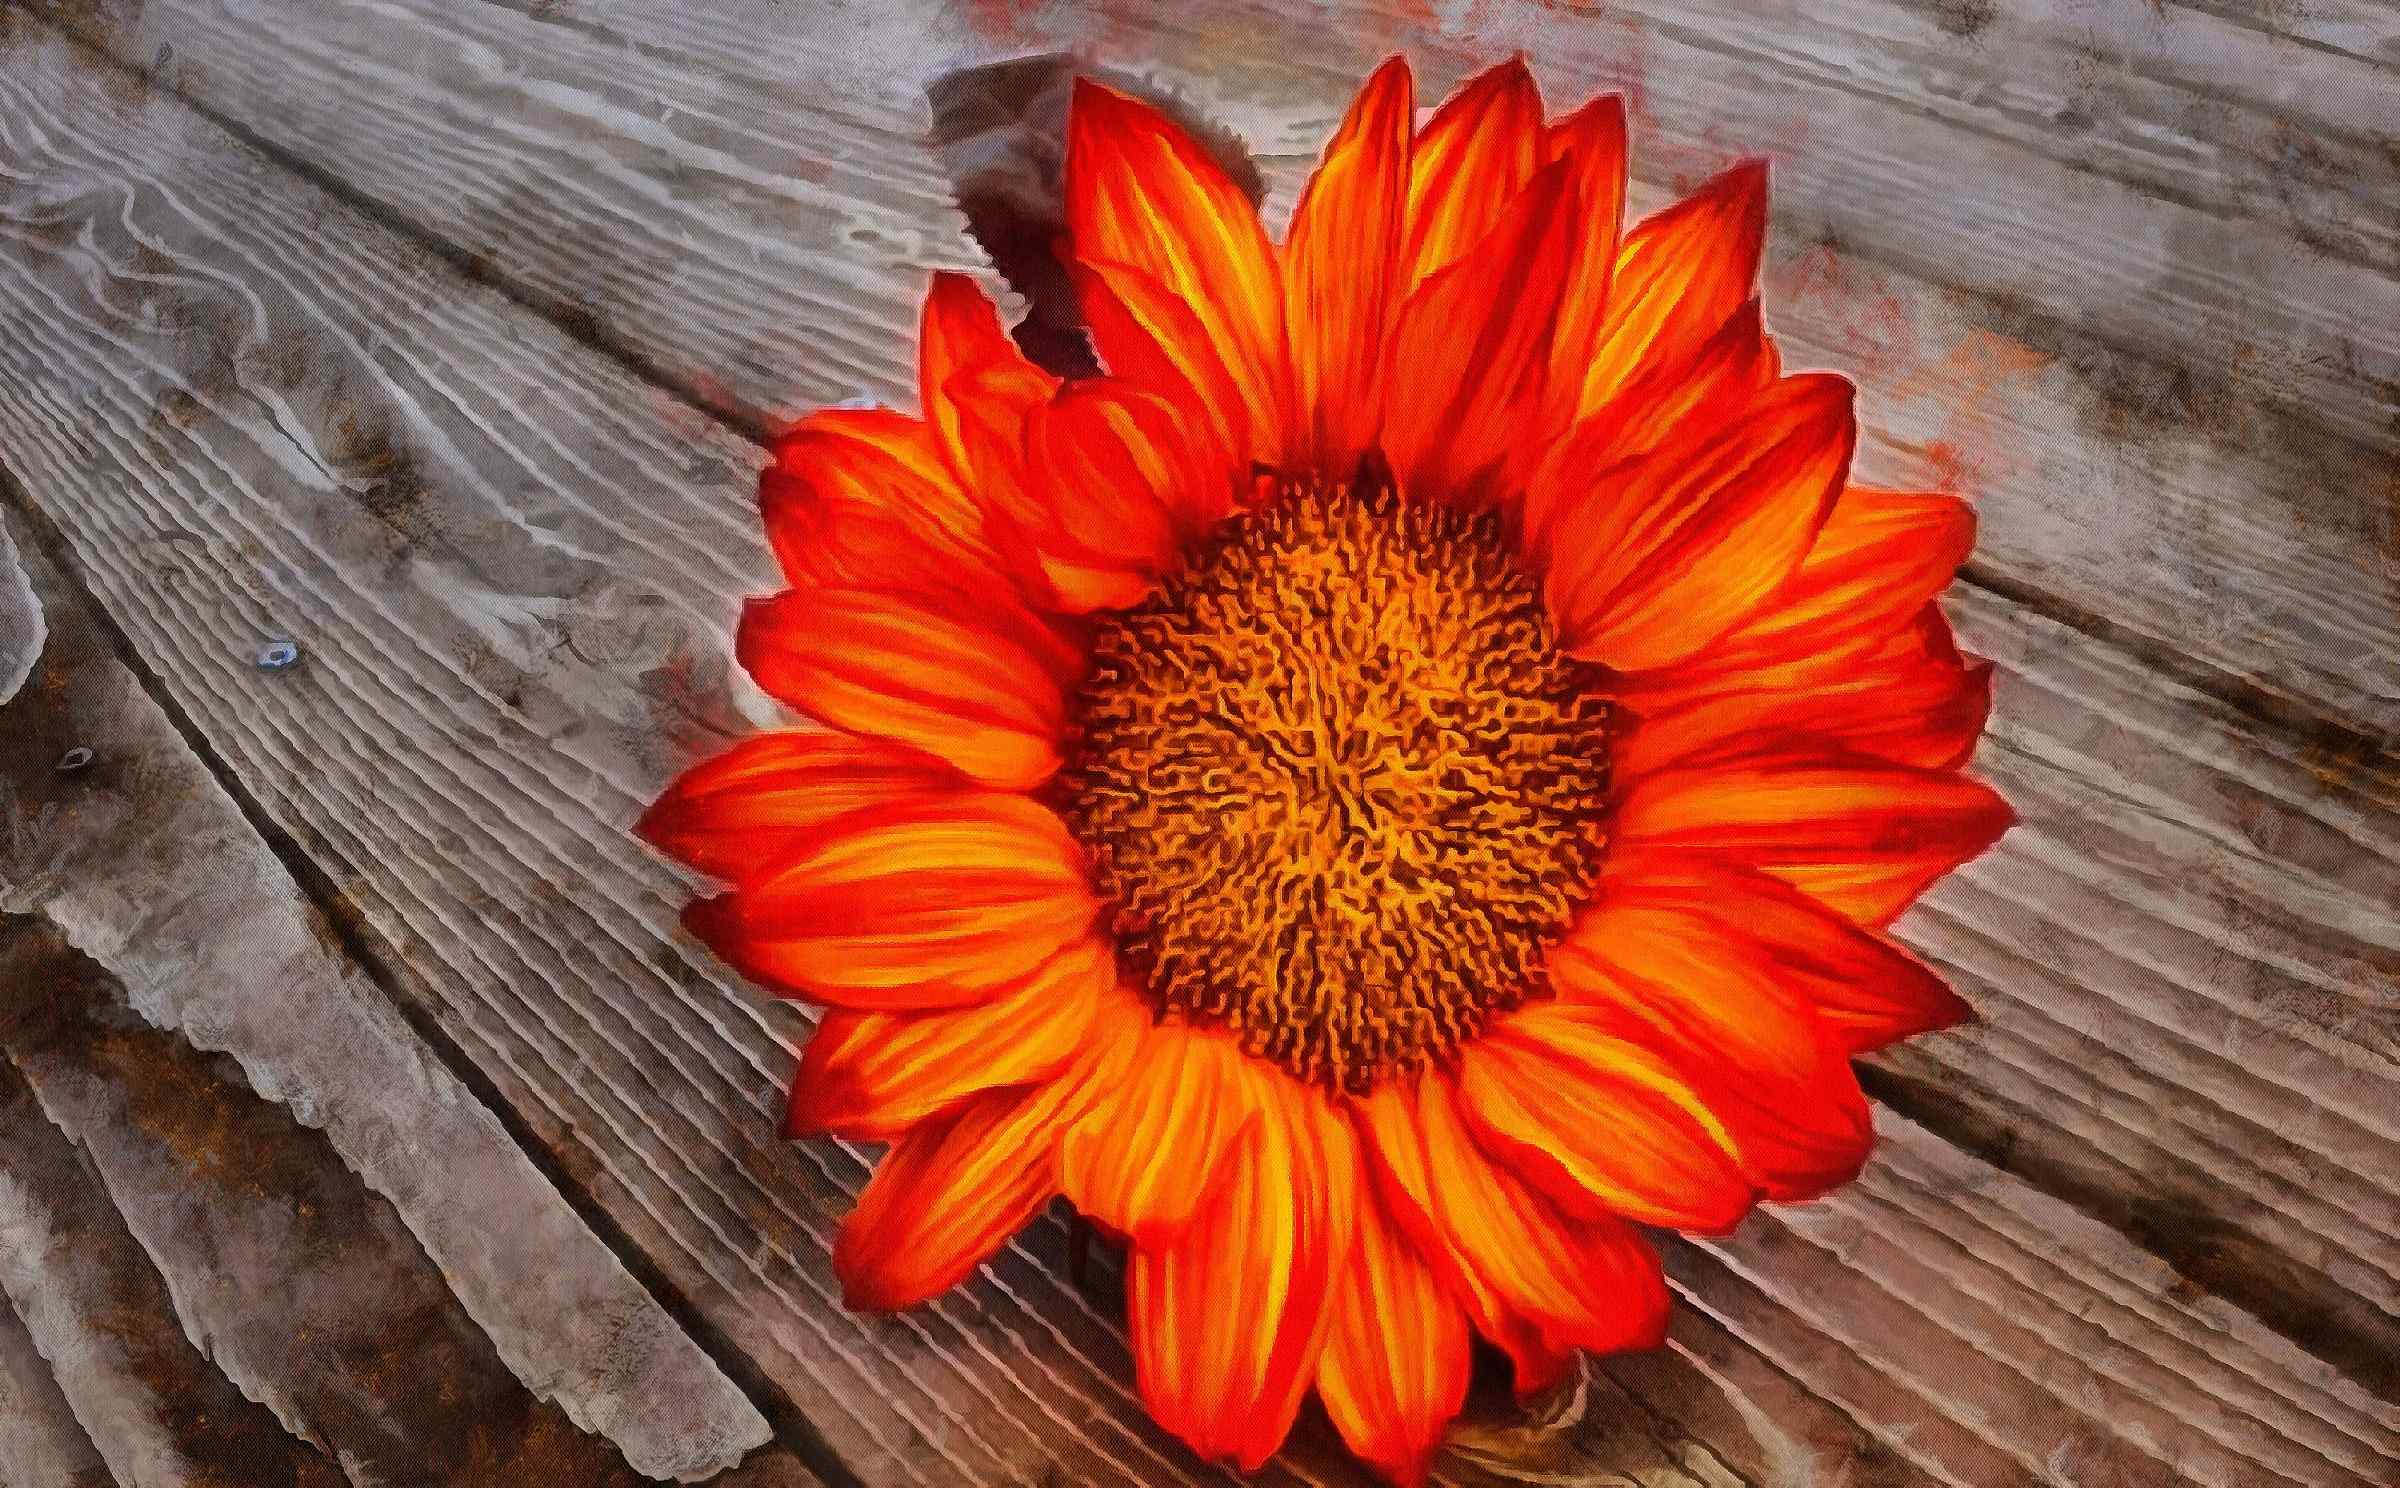 <br>flower, beautiful flower, a flower on the wooden floor